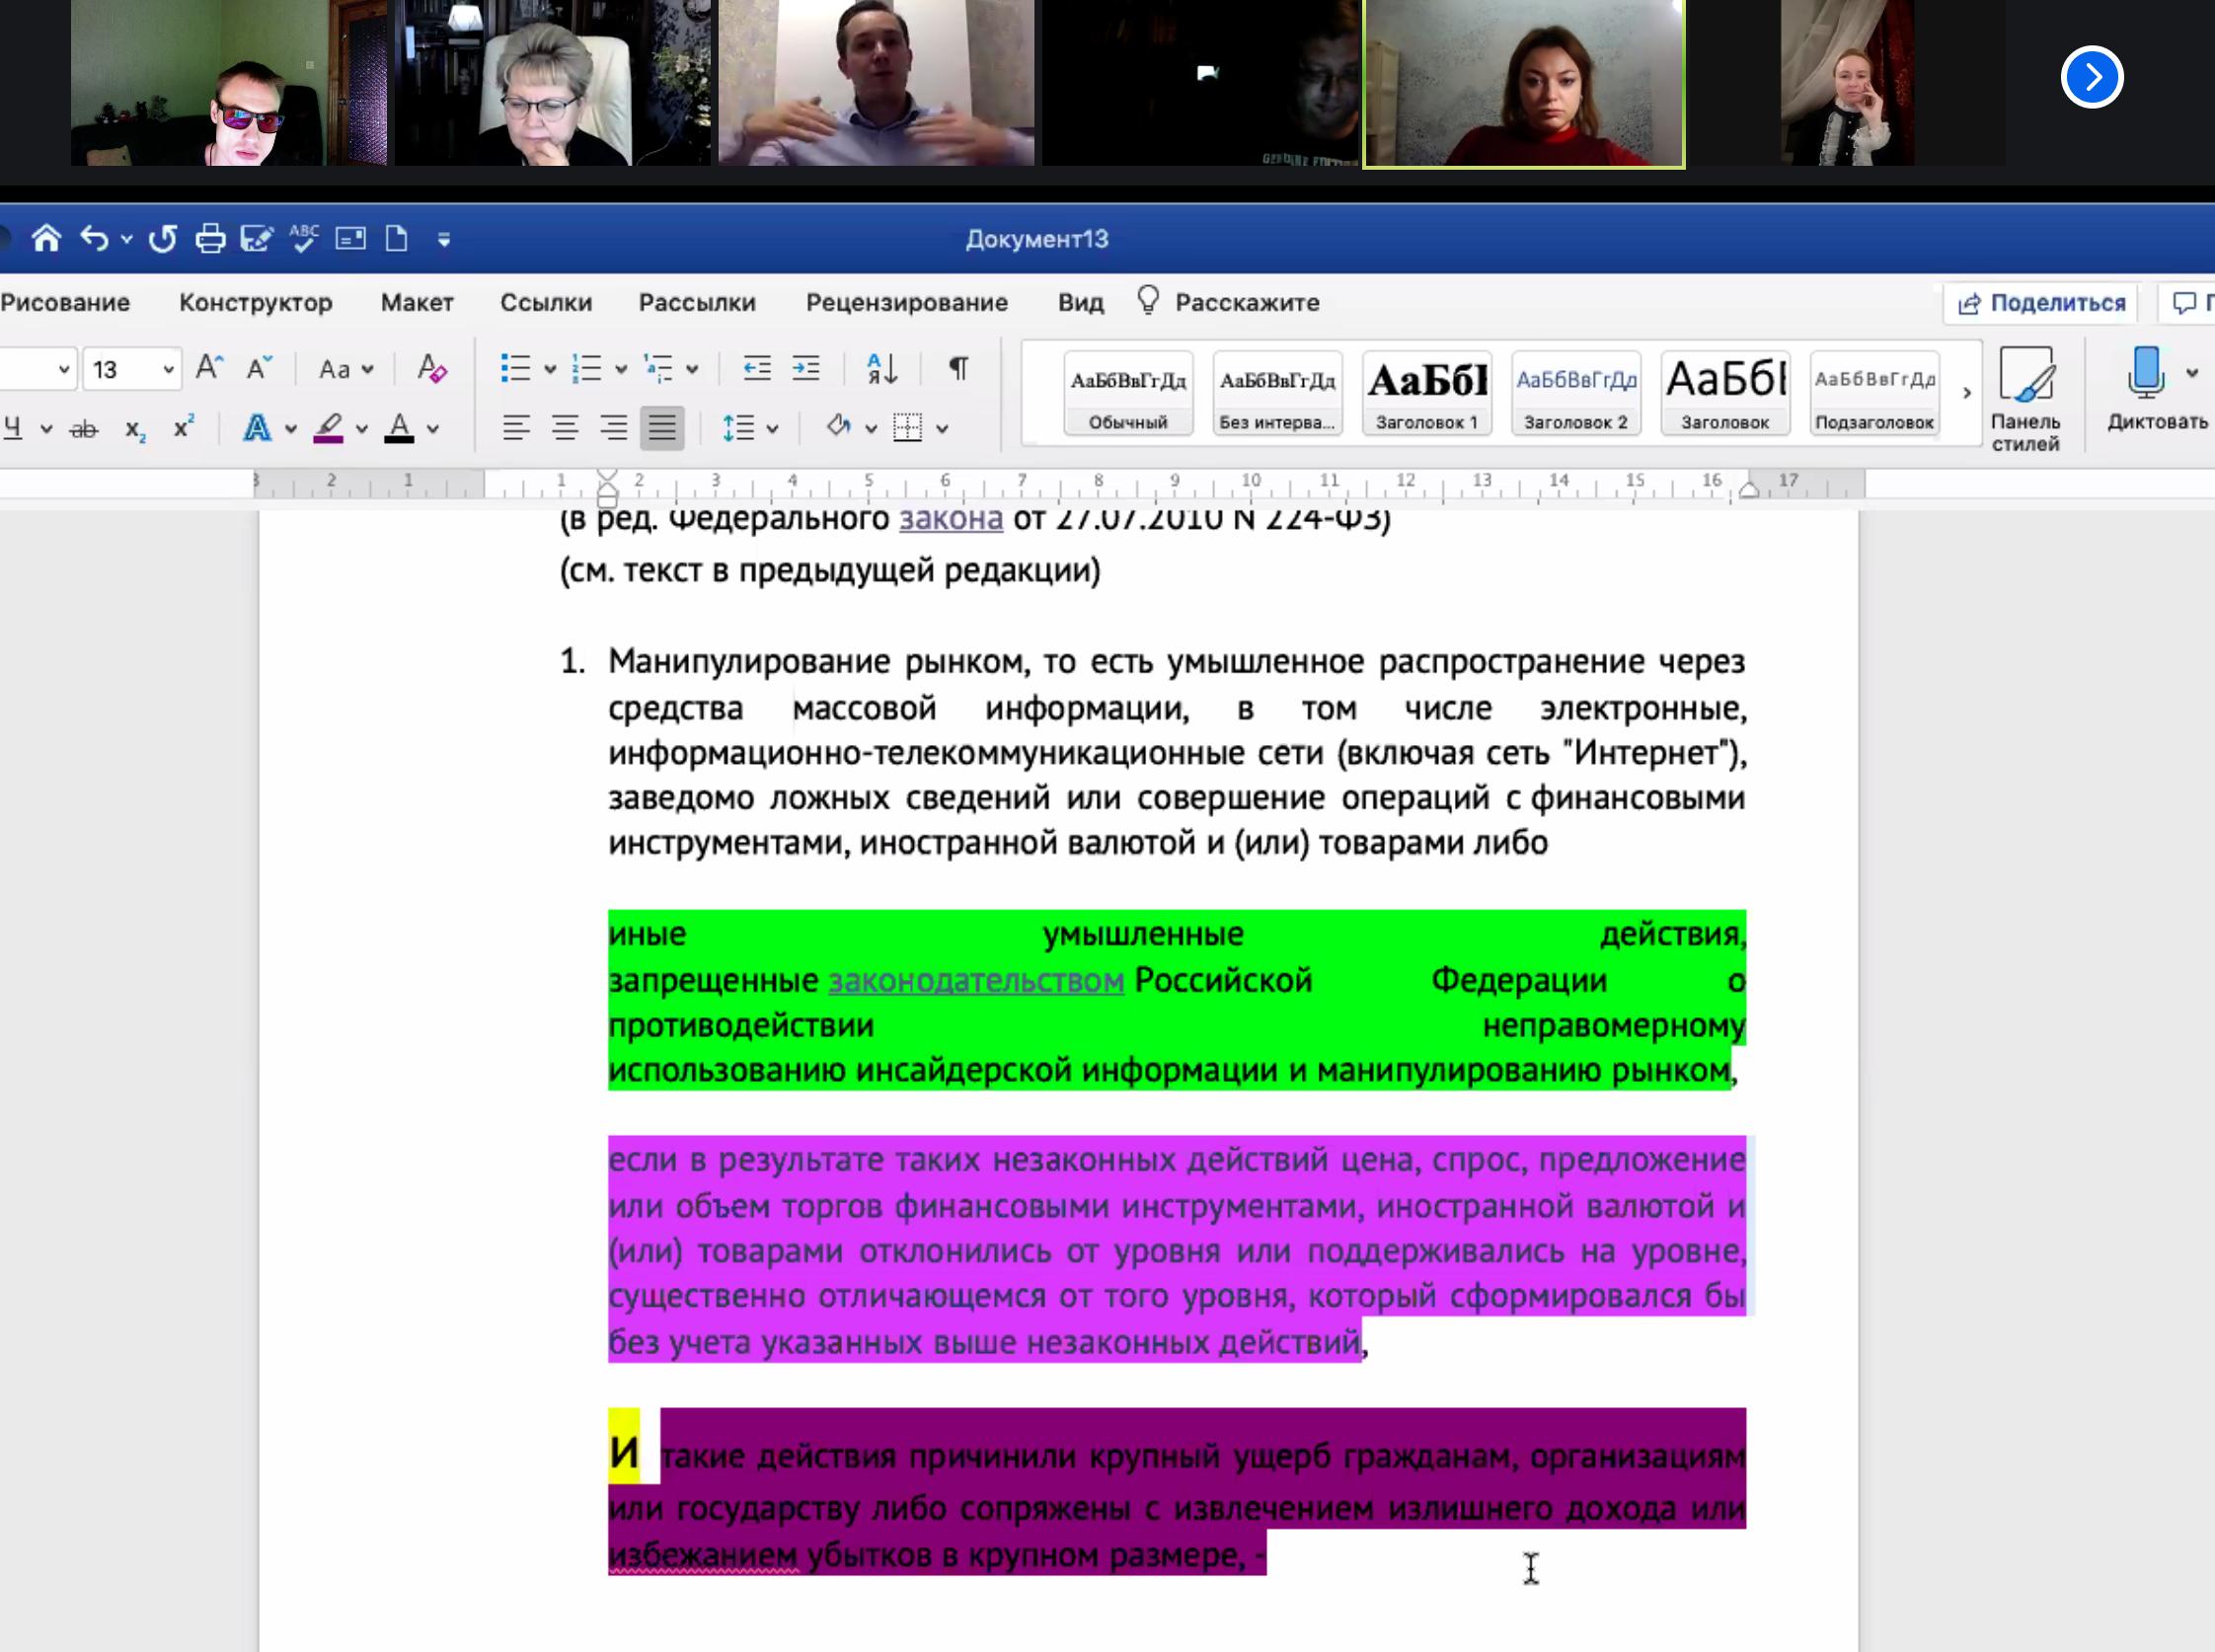 Снимок экрана 2020-11-13 в 20.01.09